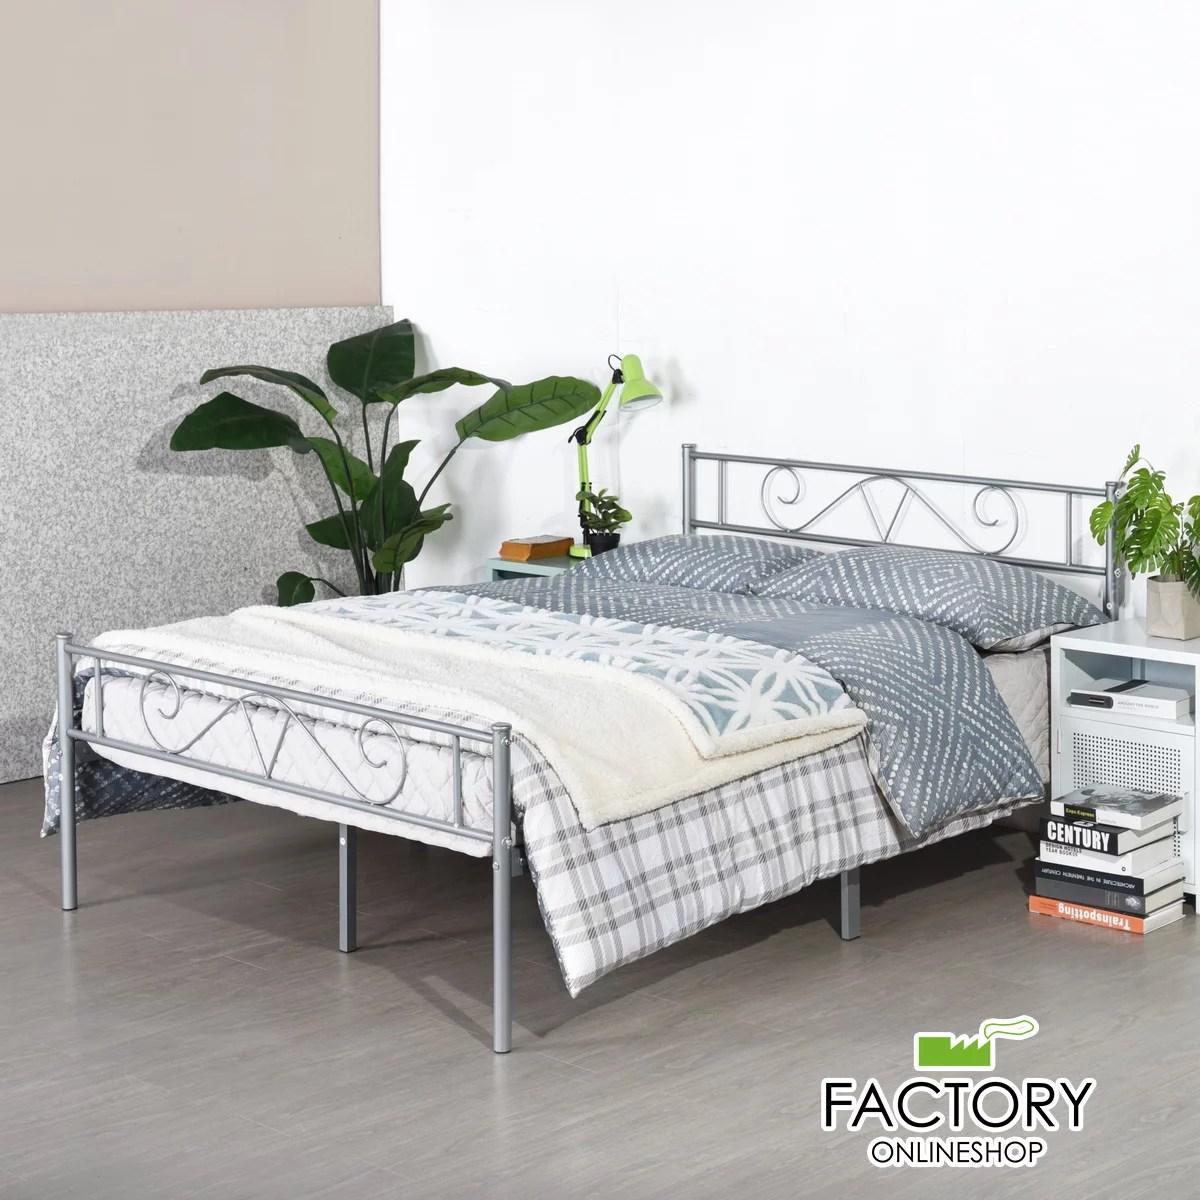 geniqua twin full queen metal bed frame platform foundation headboard footboard bedroom